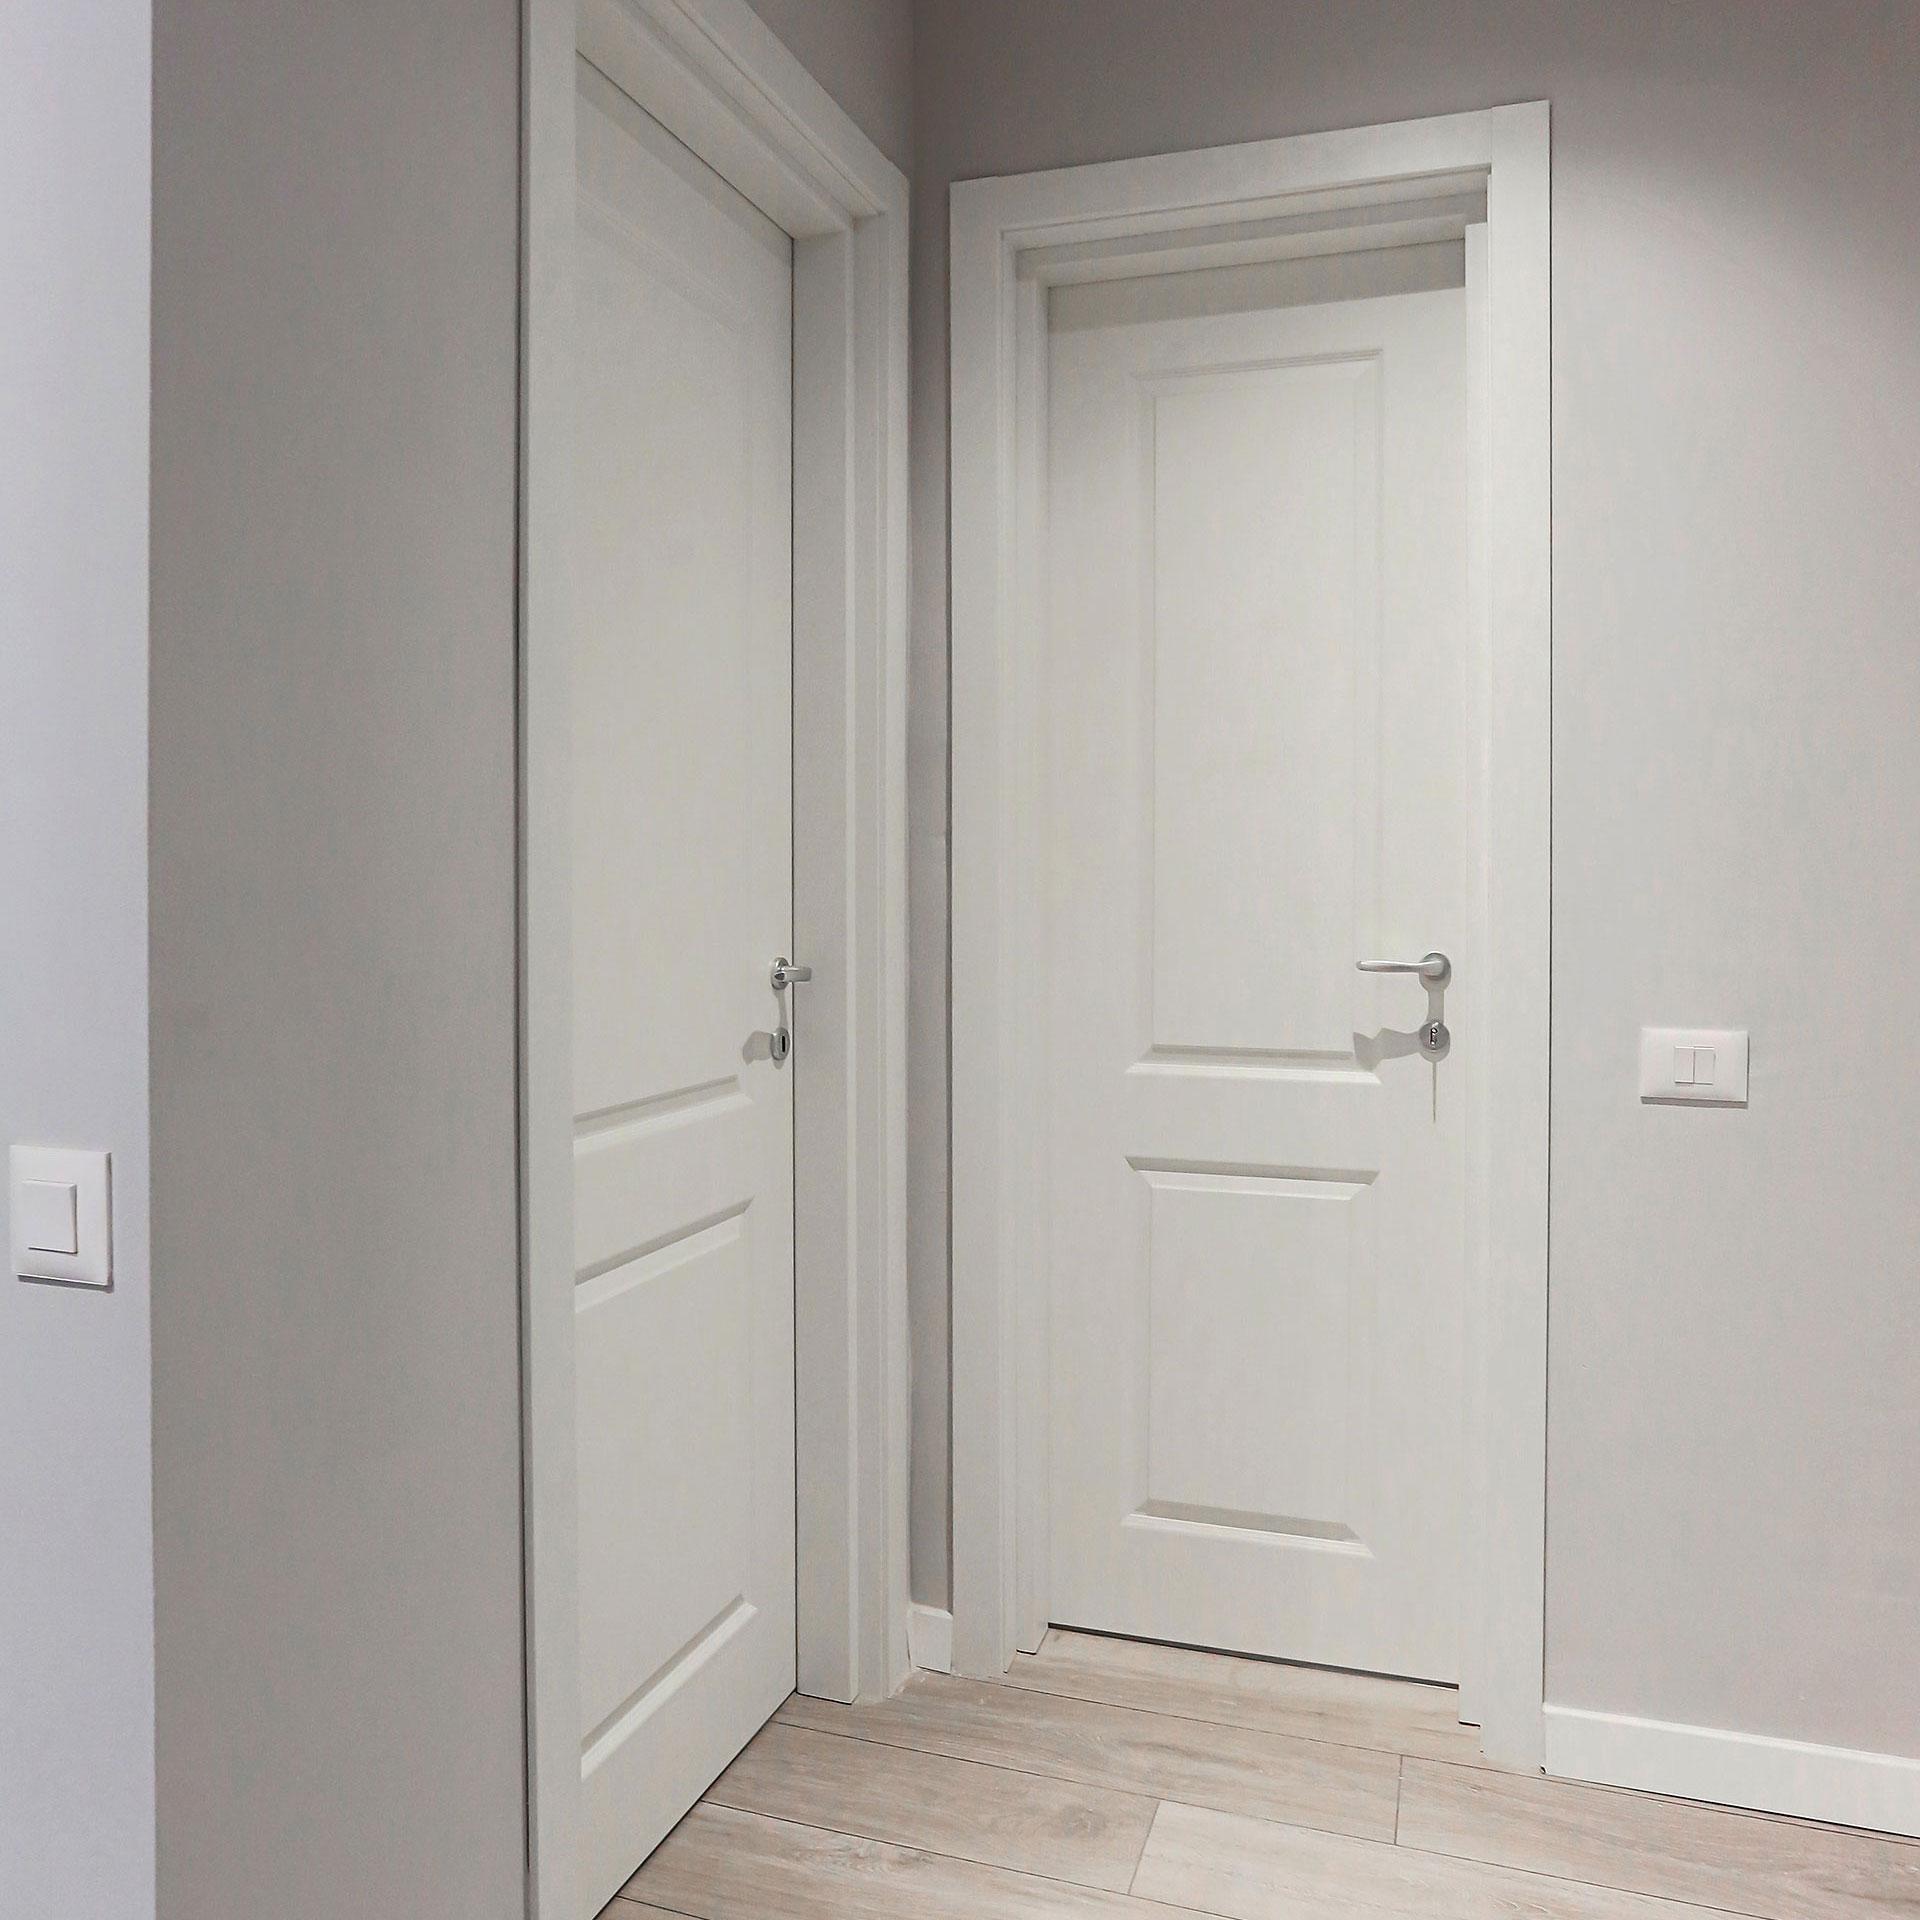 Apartamente cu 2 camere de vanzare Bucuresti - Catedral Residence - Marriott, Piata Unirii, 13 Septembrie, Izvor - G0 - 6